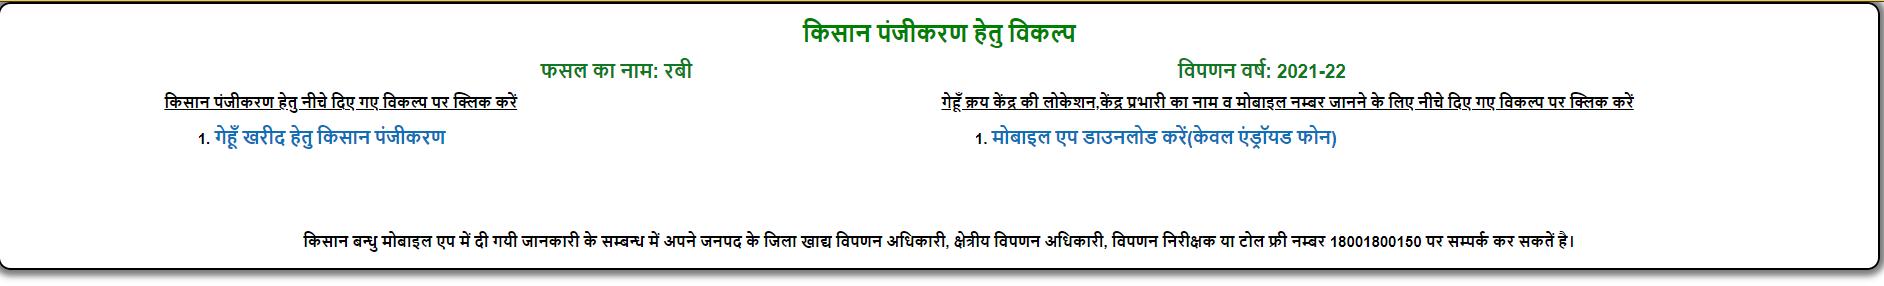 उत्तर-प्रदेश-गेहूं-खरीद-ऑनलाइन-किसान-पंजीकरण